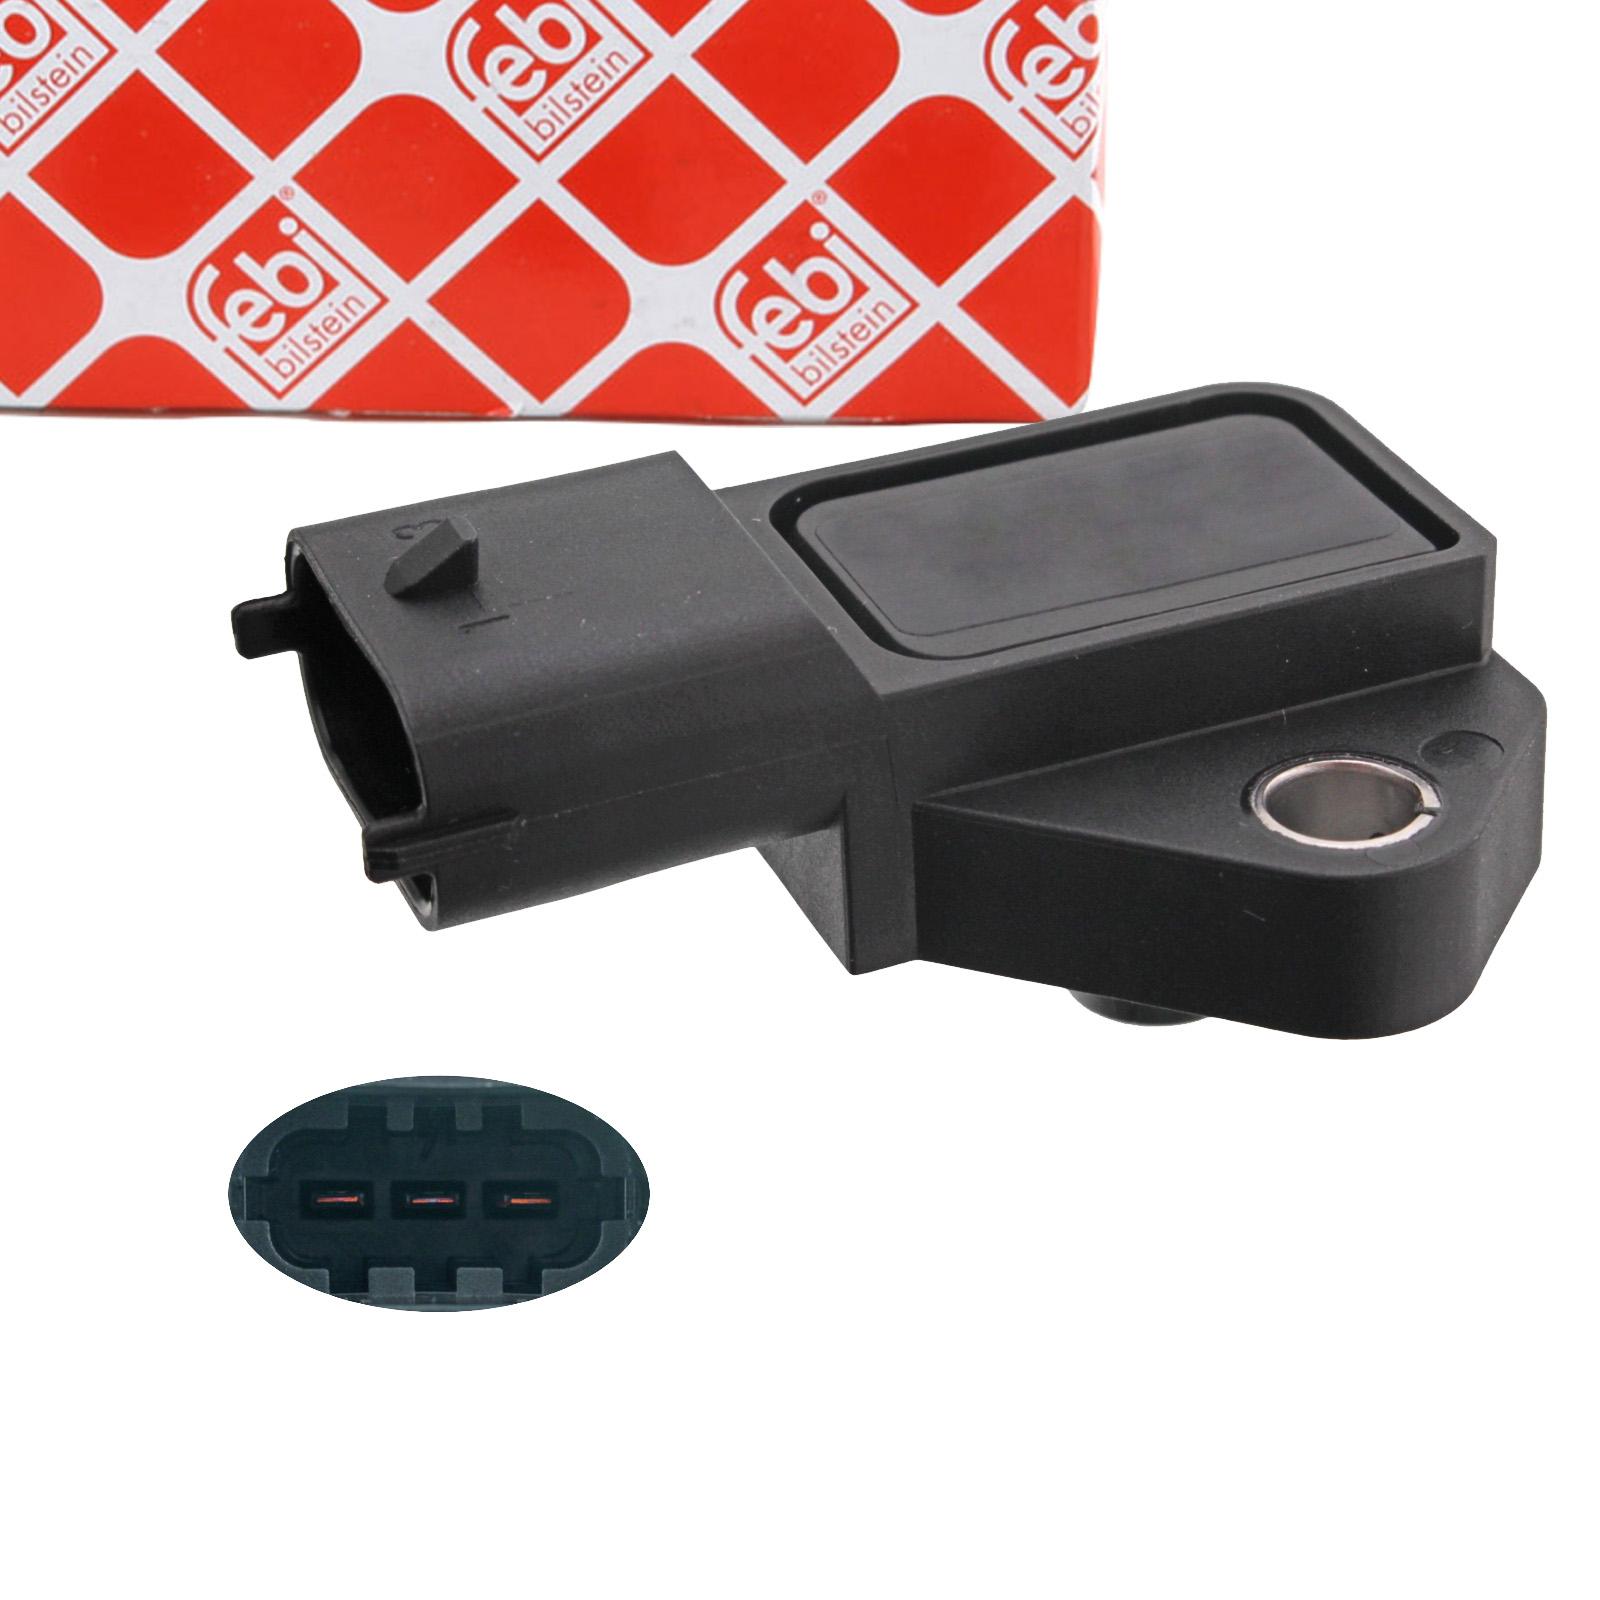 FEBI 100657 Saugrohrdrucksensor OPEL Corsa D S07 Signum CC Z03 Vectra C / CC Z02 6235707